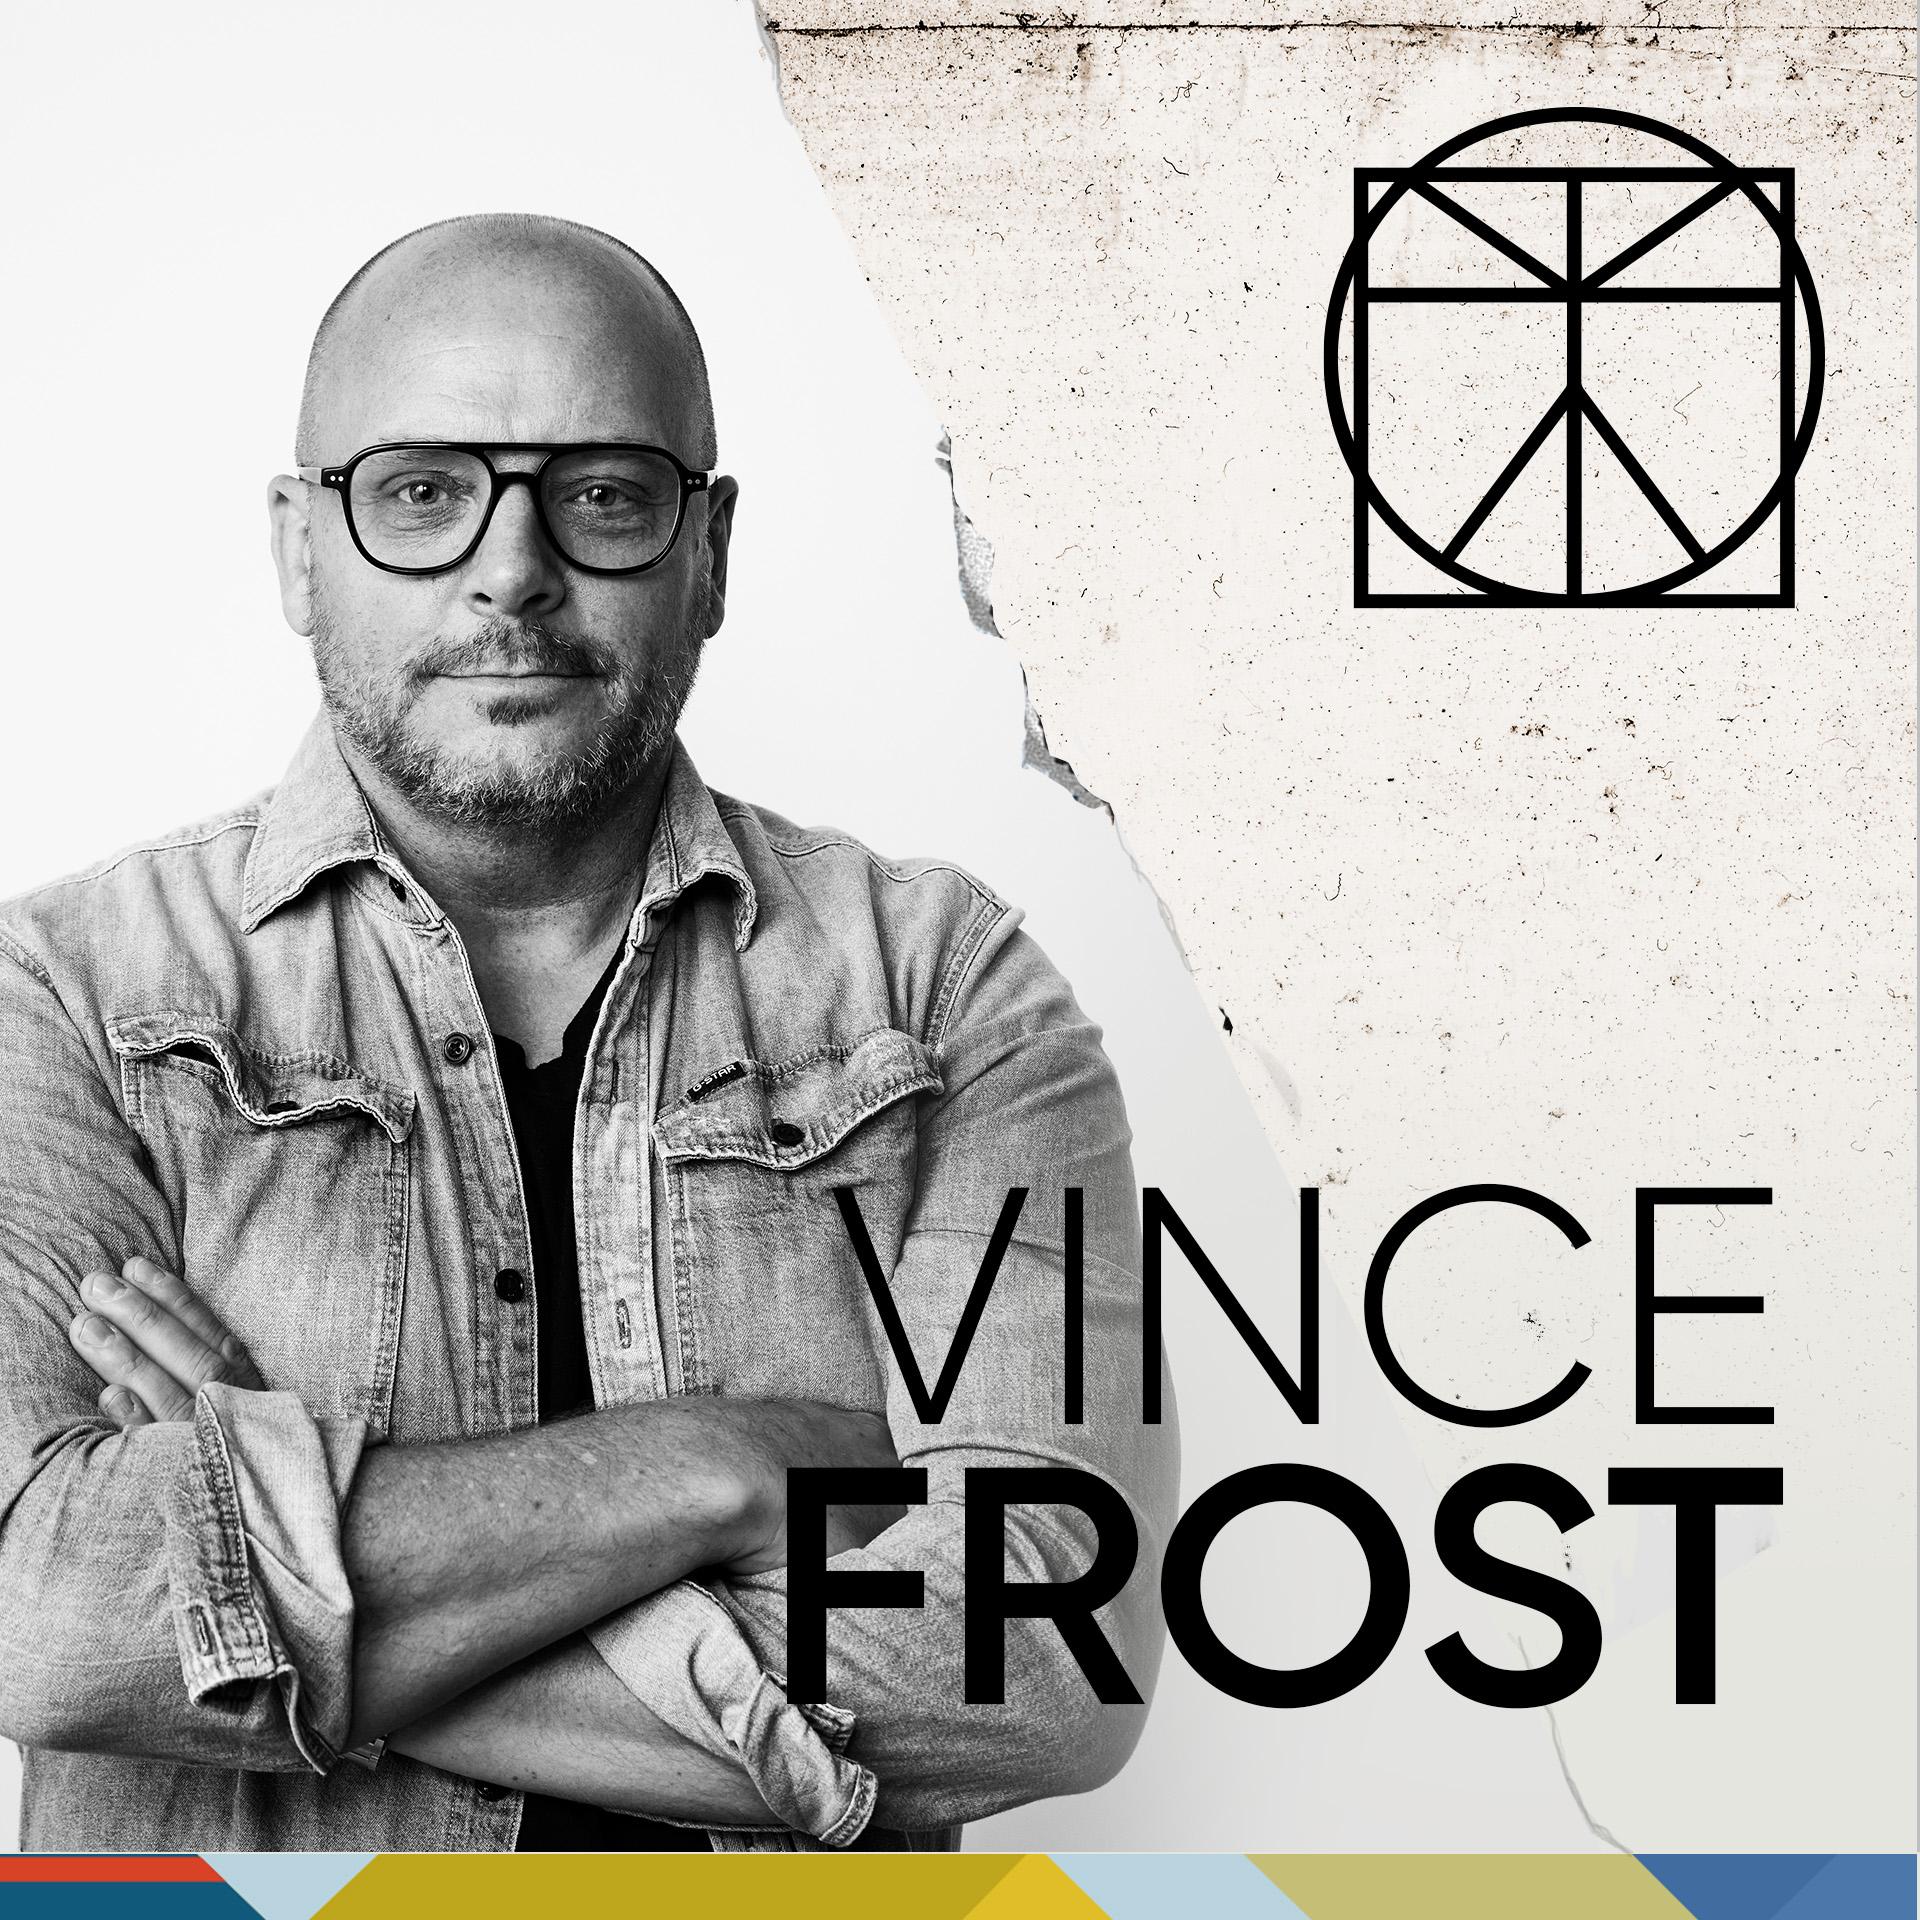 Vince Frost 2nd Renaissance Anders Sorman-Nilsson